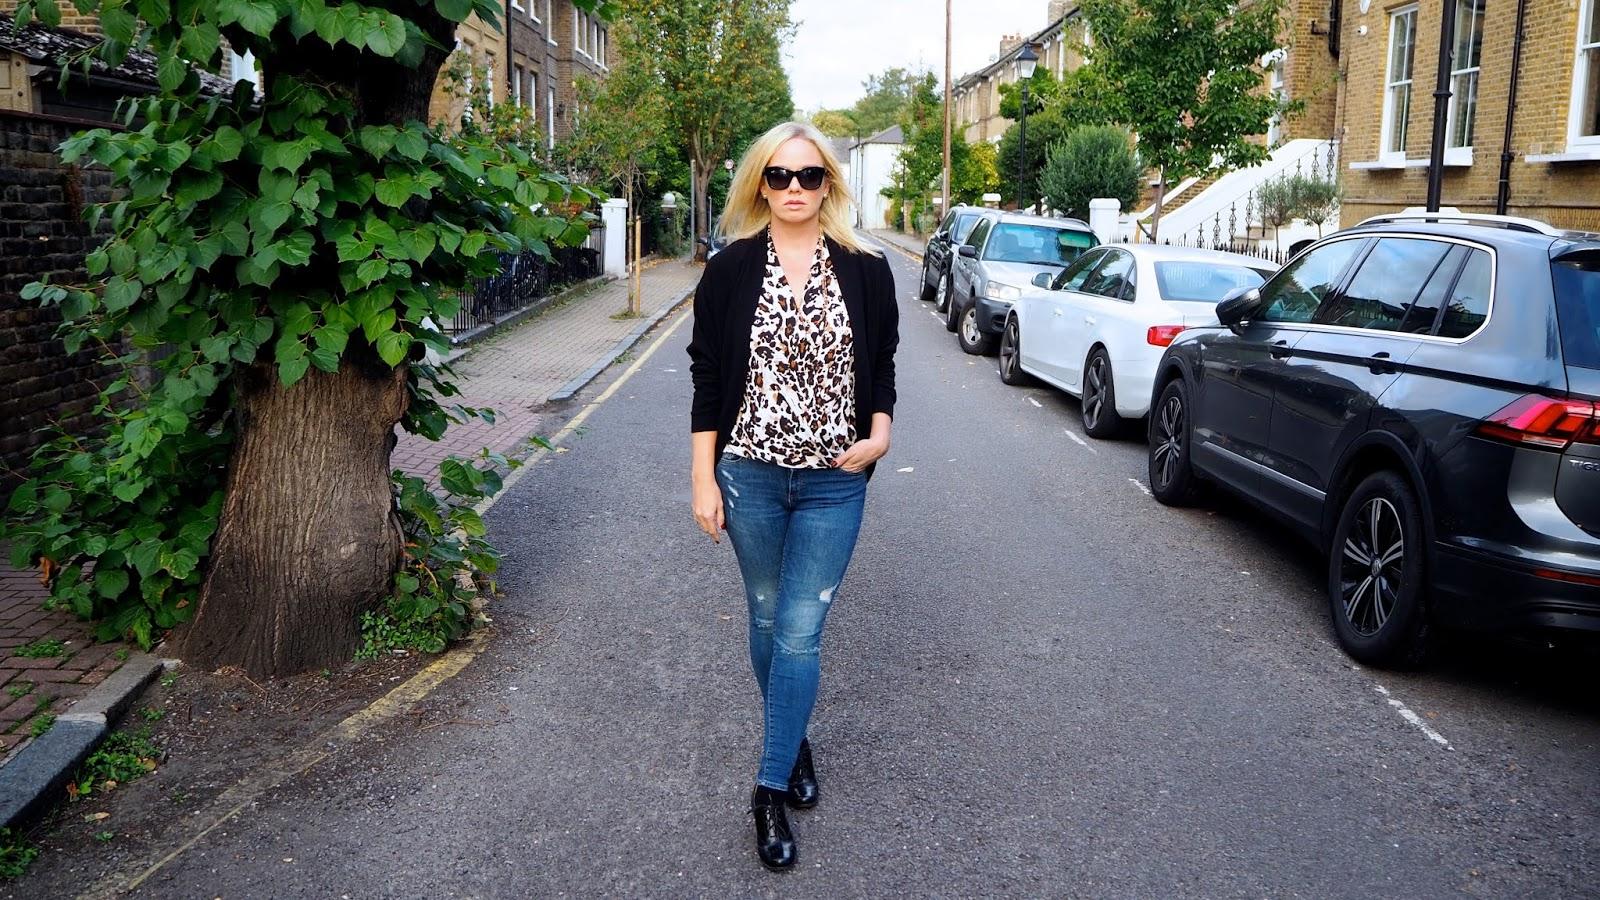 Leopard print top, distressed jeans, black brogues, black cardigan, black sunglasses